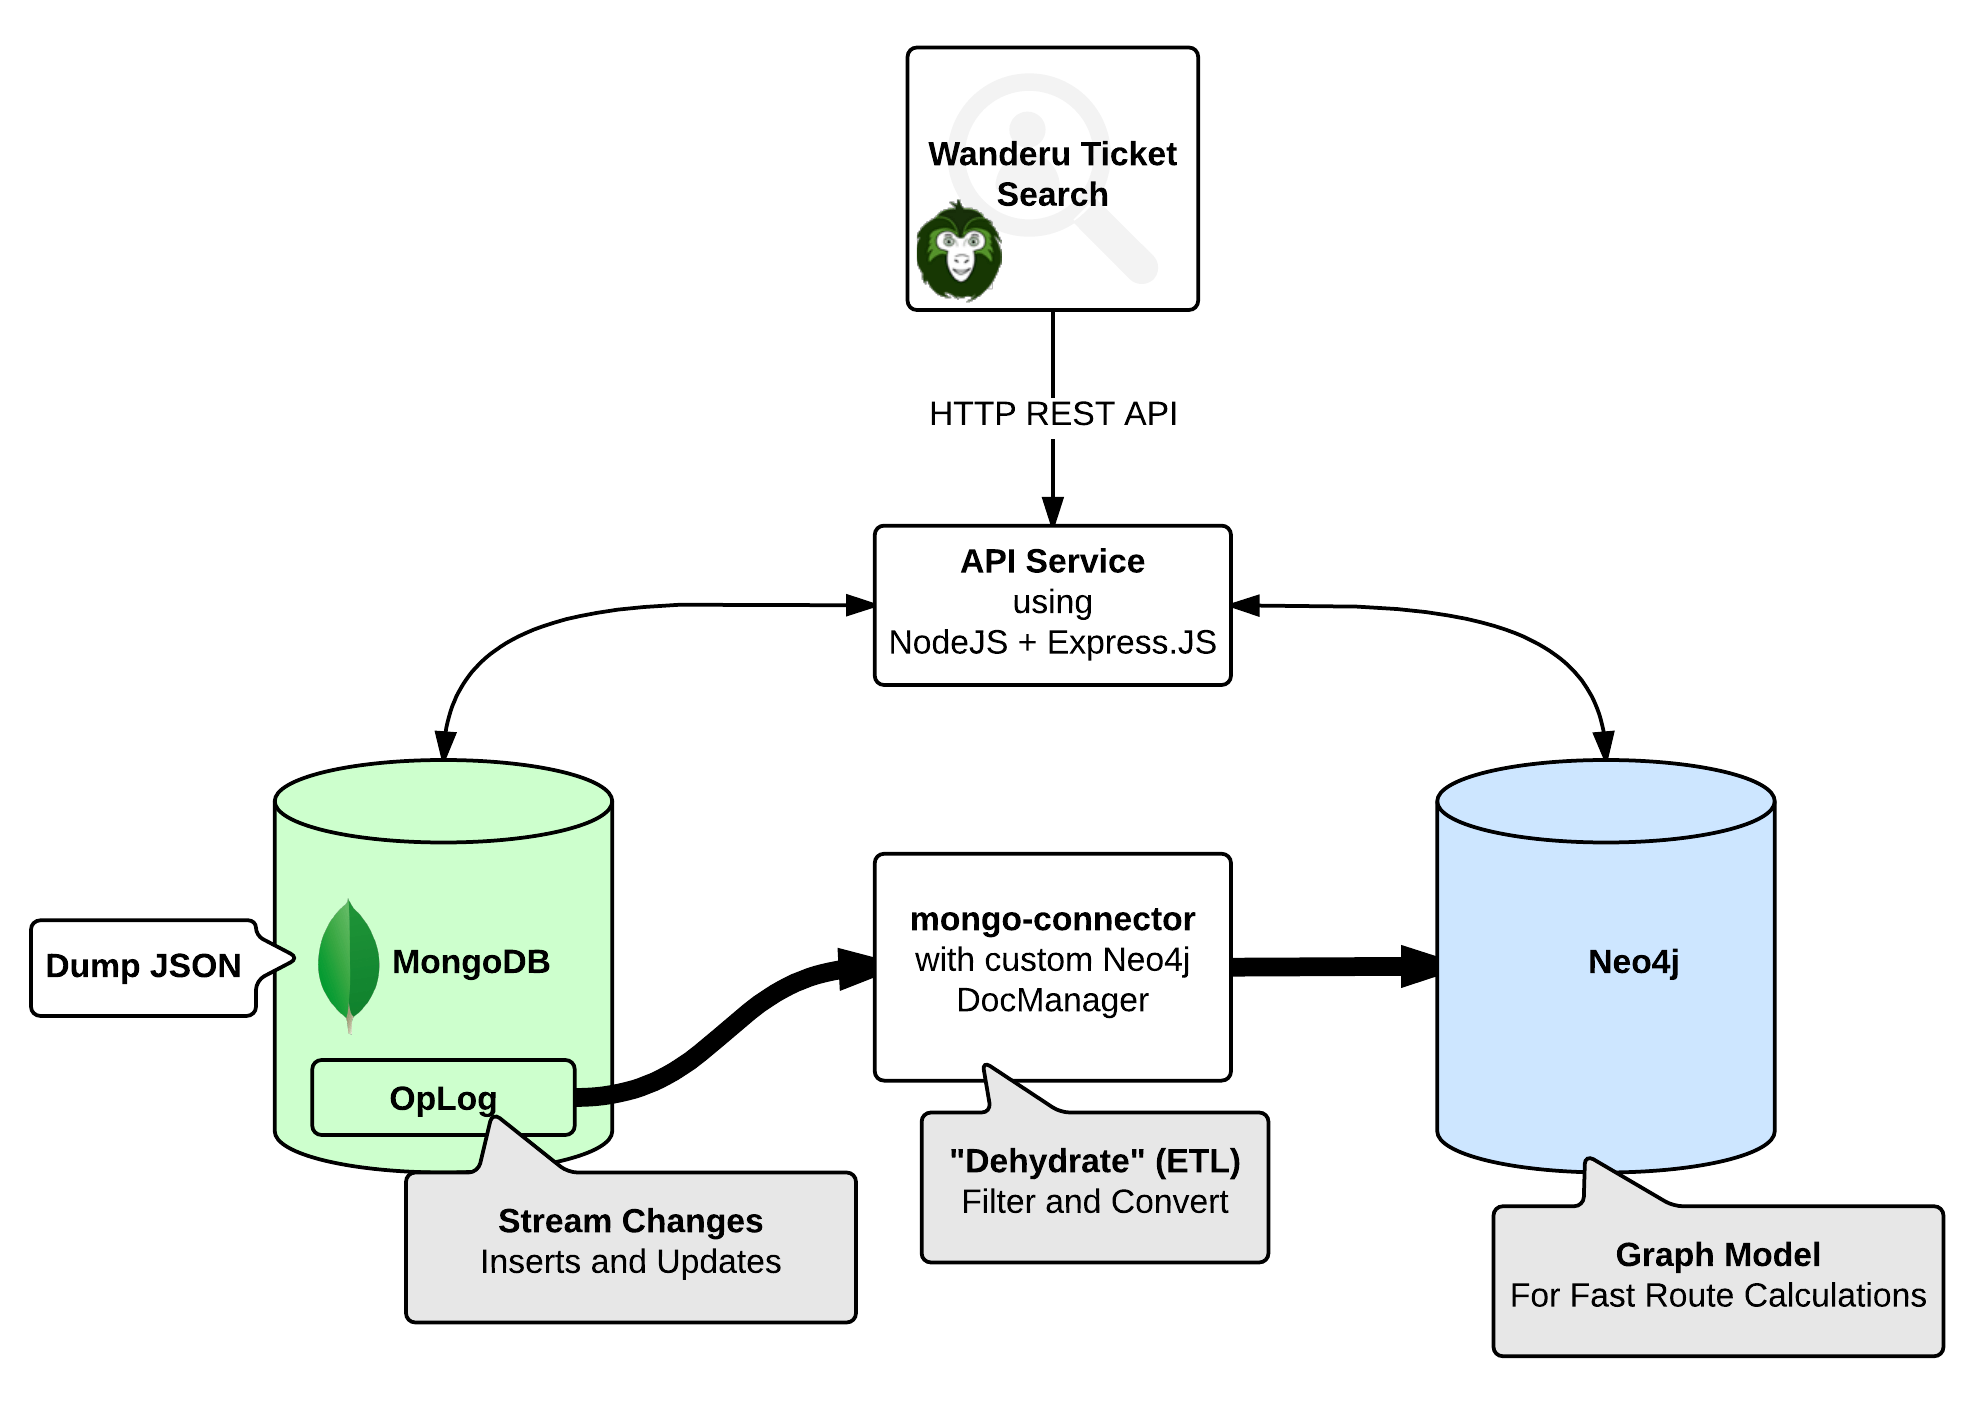 database architecture diagram 1990 honda civic fuse box polyglot persistence case study wanderu 43 neo4j mongodb